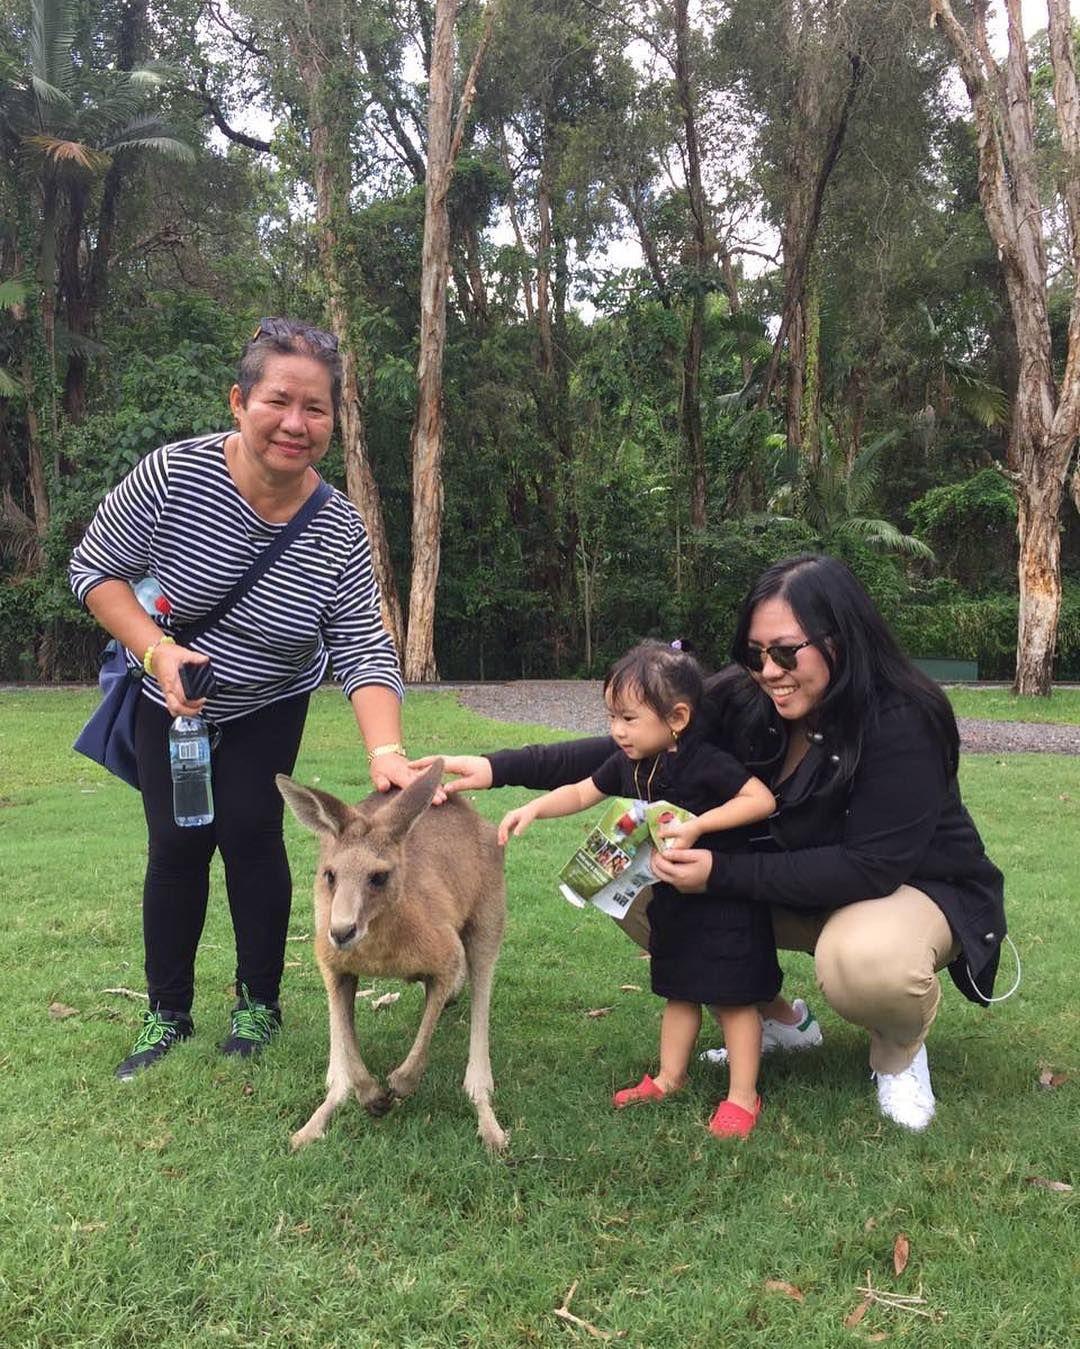 #kangaroo #joey #outbackjack #goldcoast #wildlife #currumbin #currumbinwildlifesanctuary #australia by twirang http://ift.tt/1X9mXhV